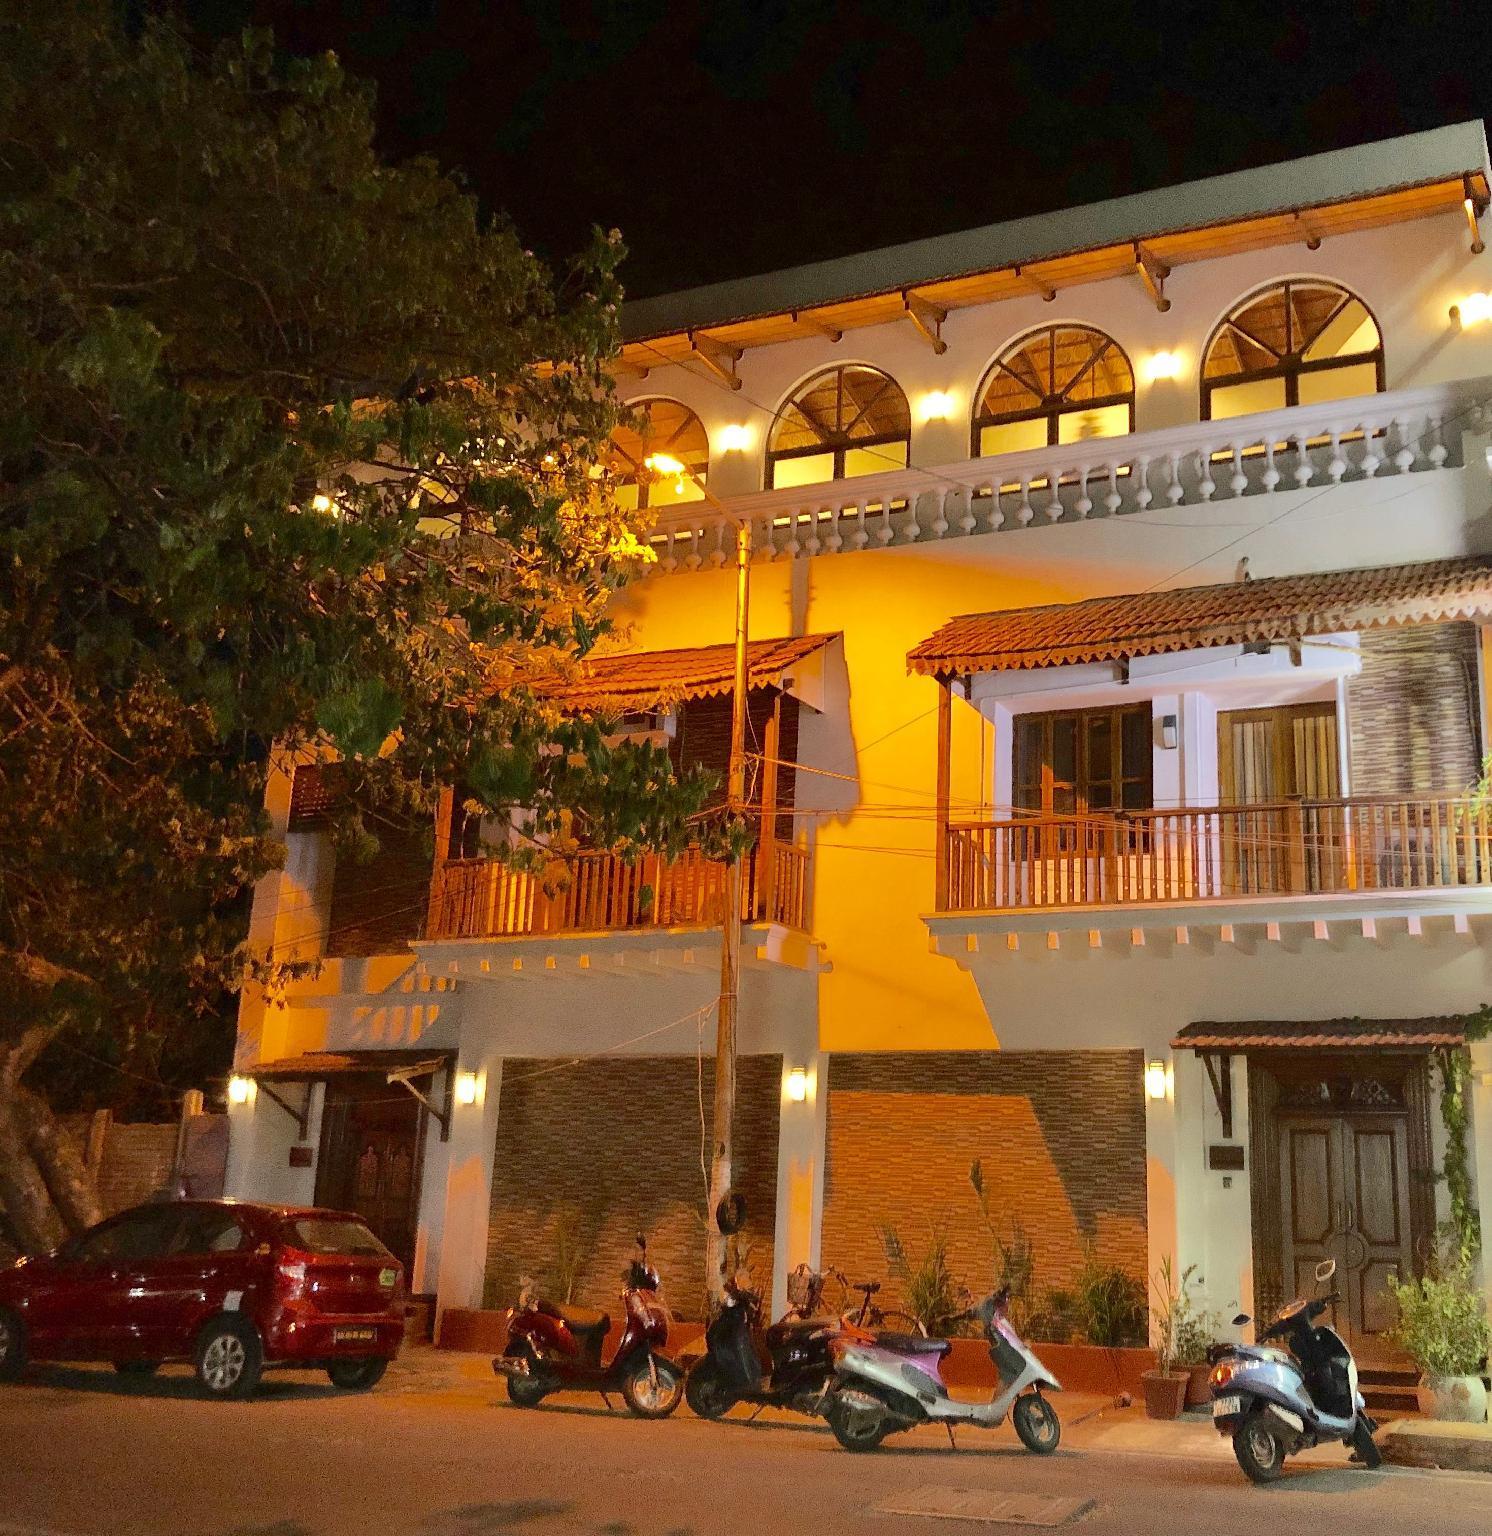 La Maison Pondichery